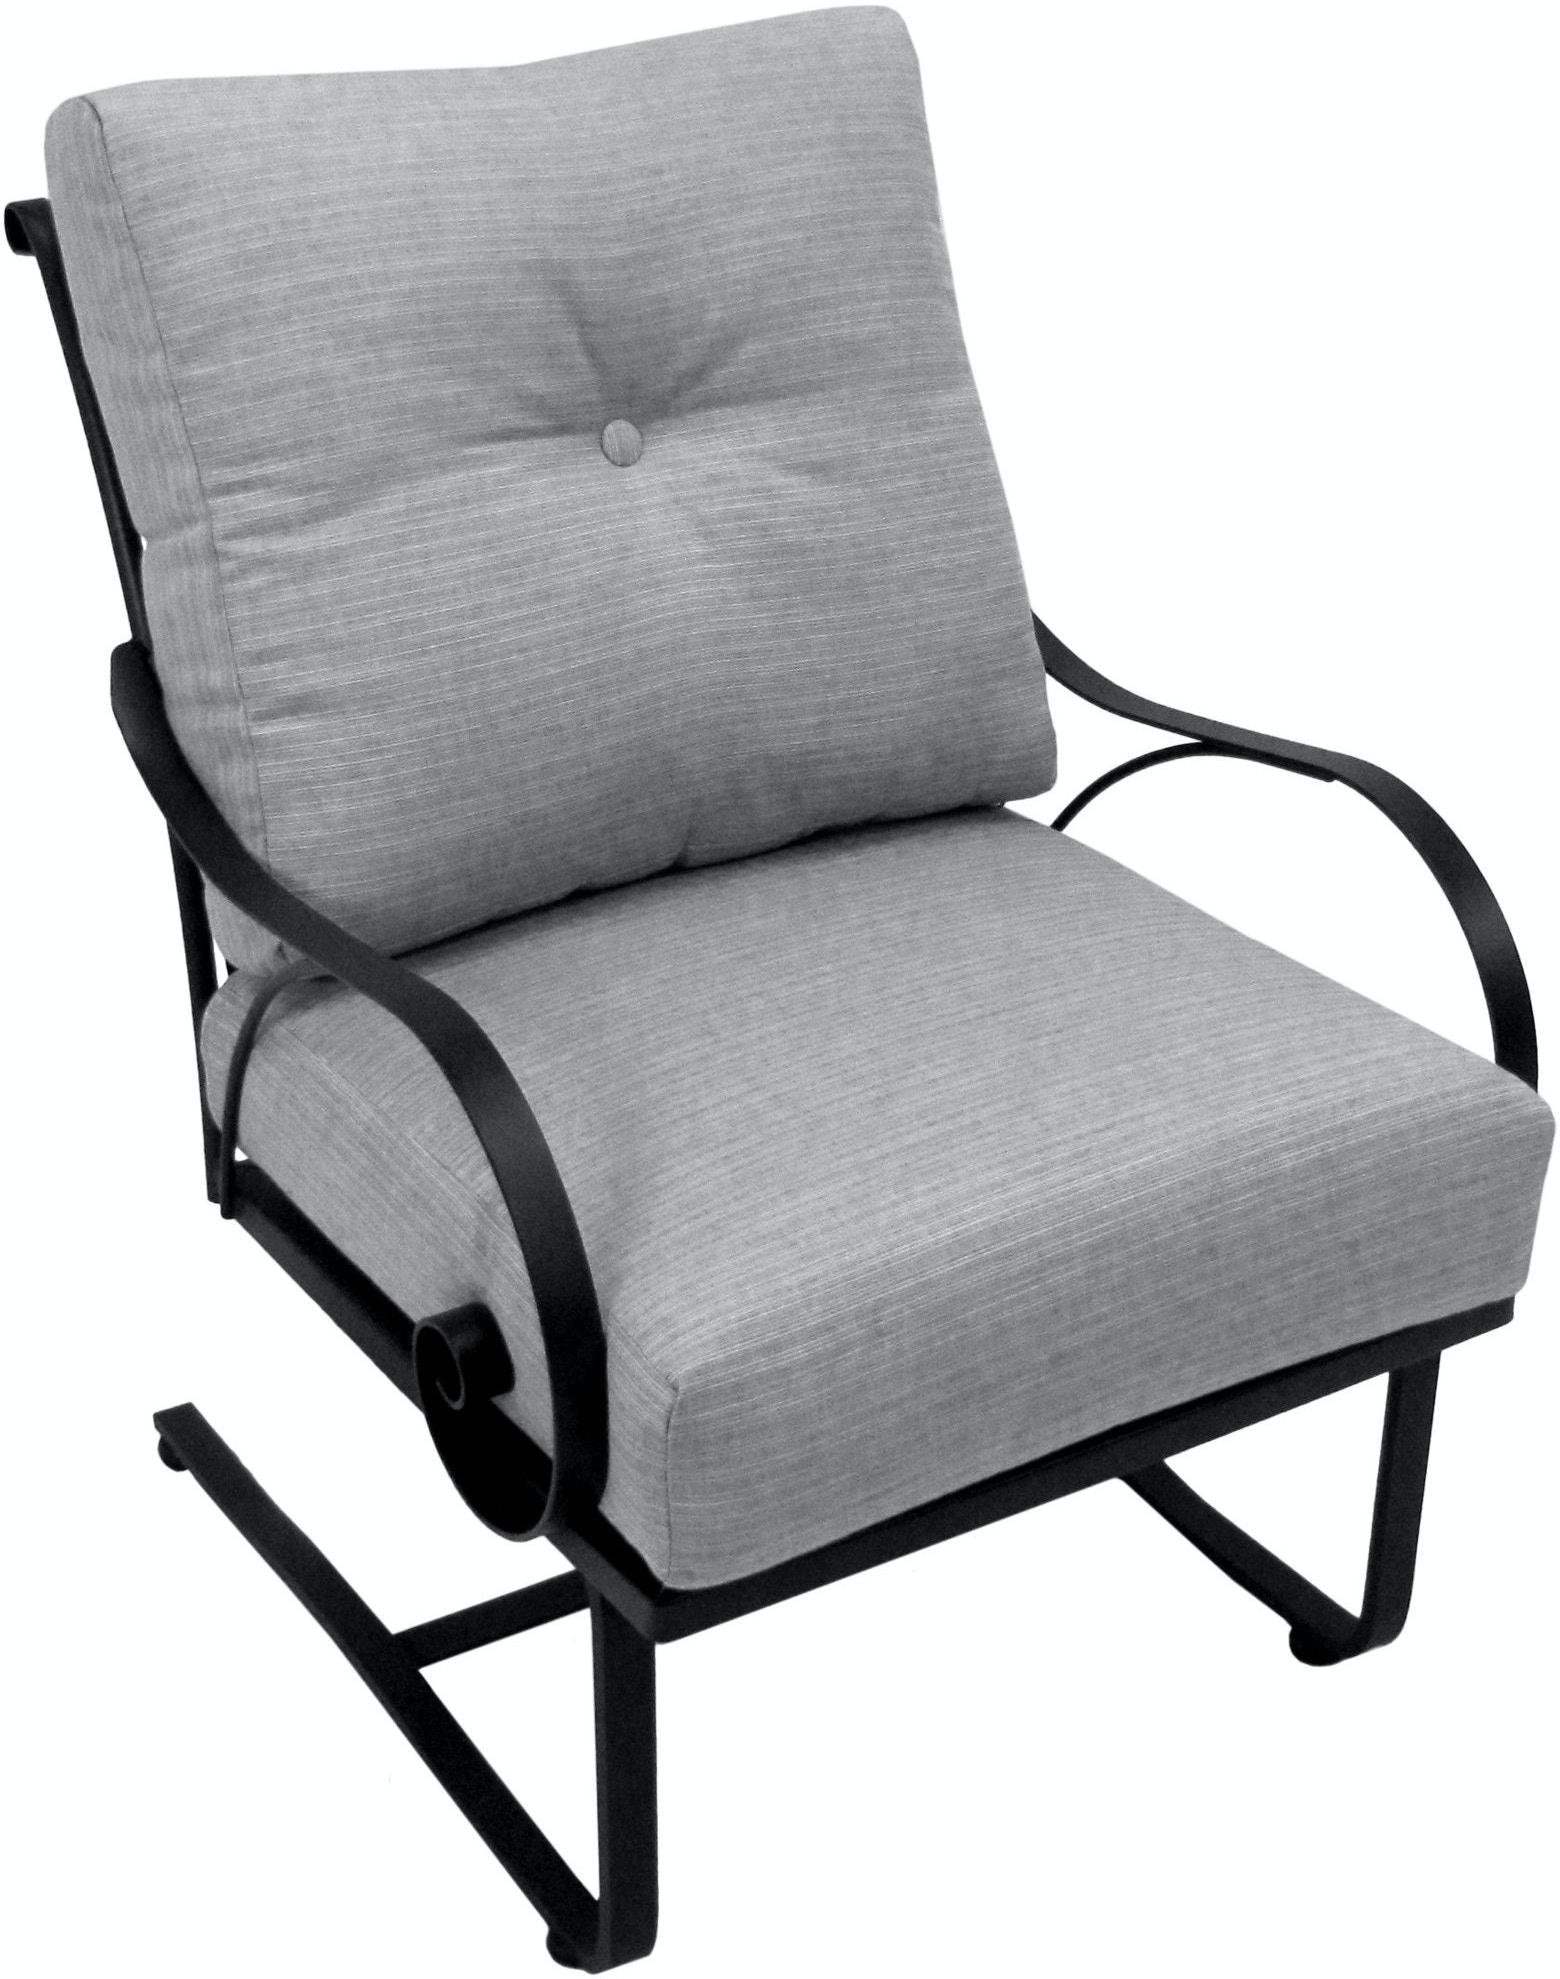 Meadowcraft Outdoor Patio Monticello Club Spring Chair